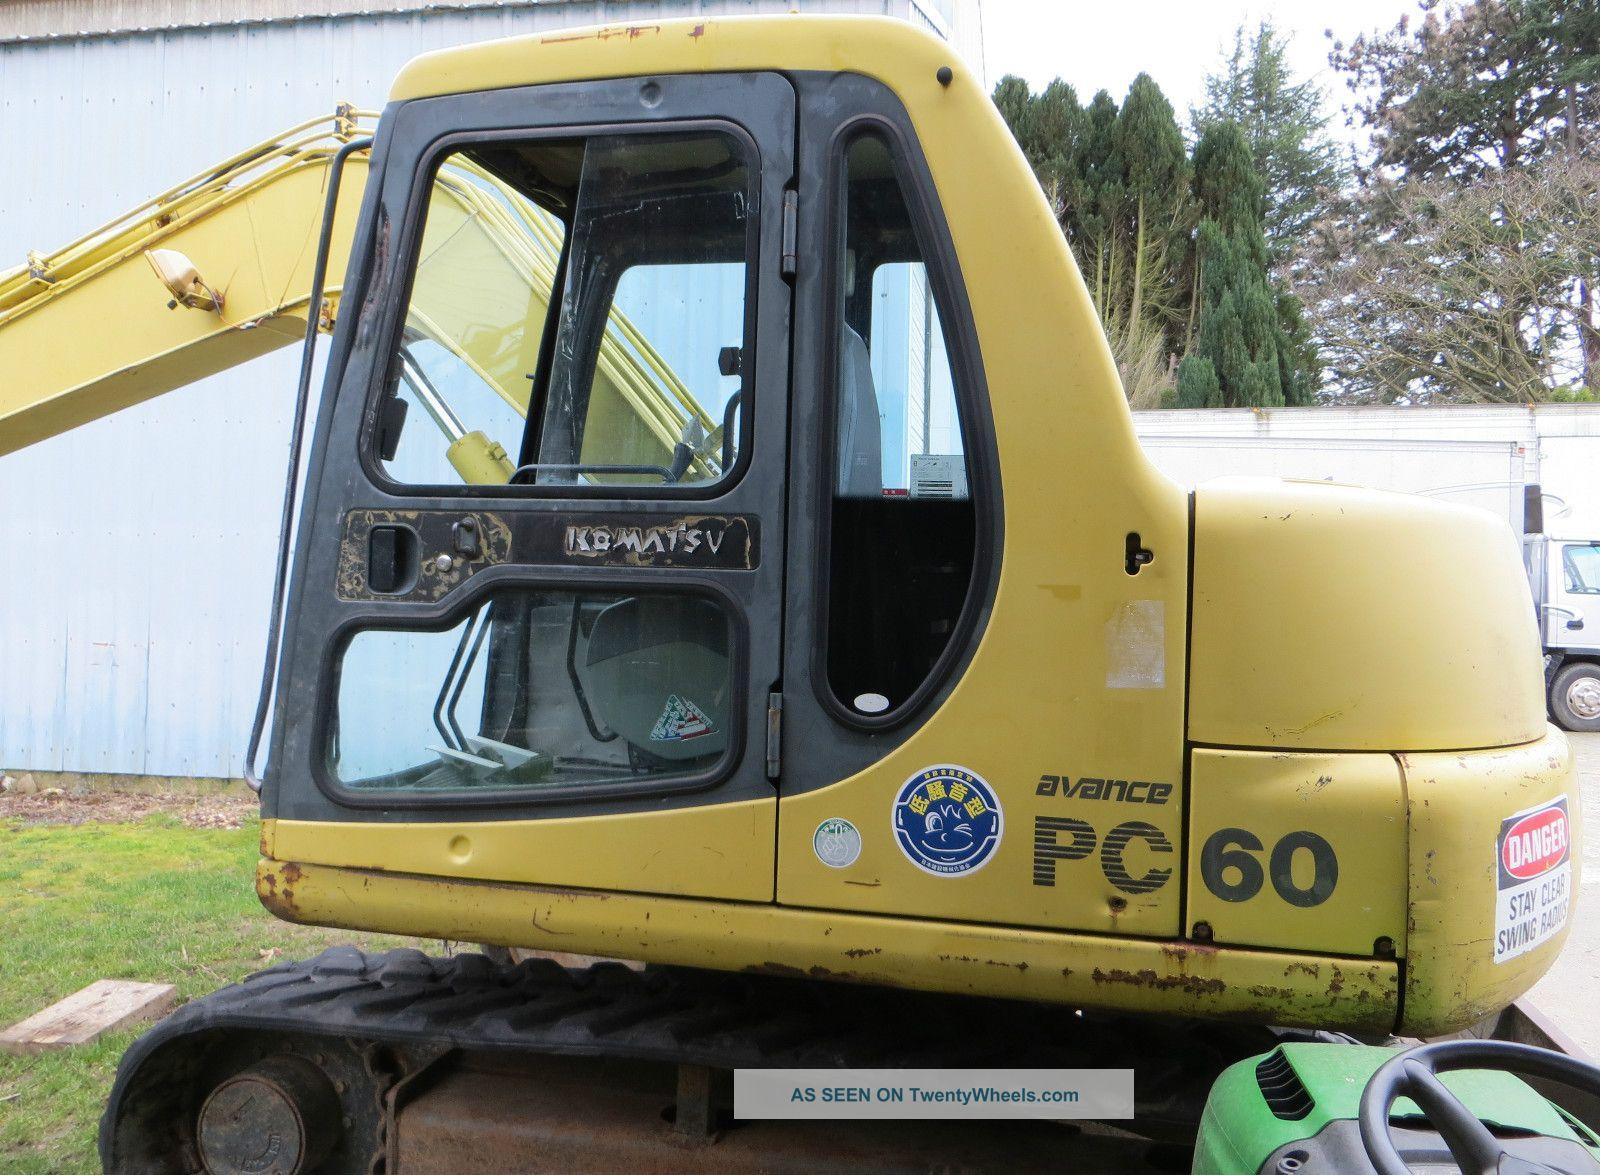 Komatsu Pc 60 Rubber Trac Excavators photo